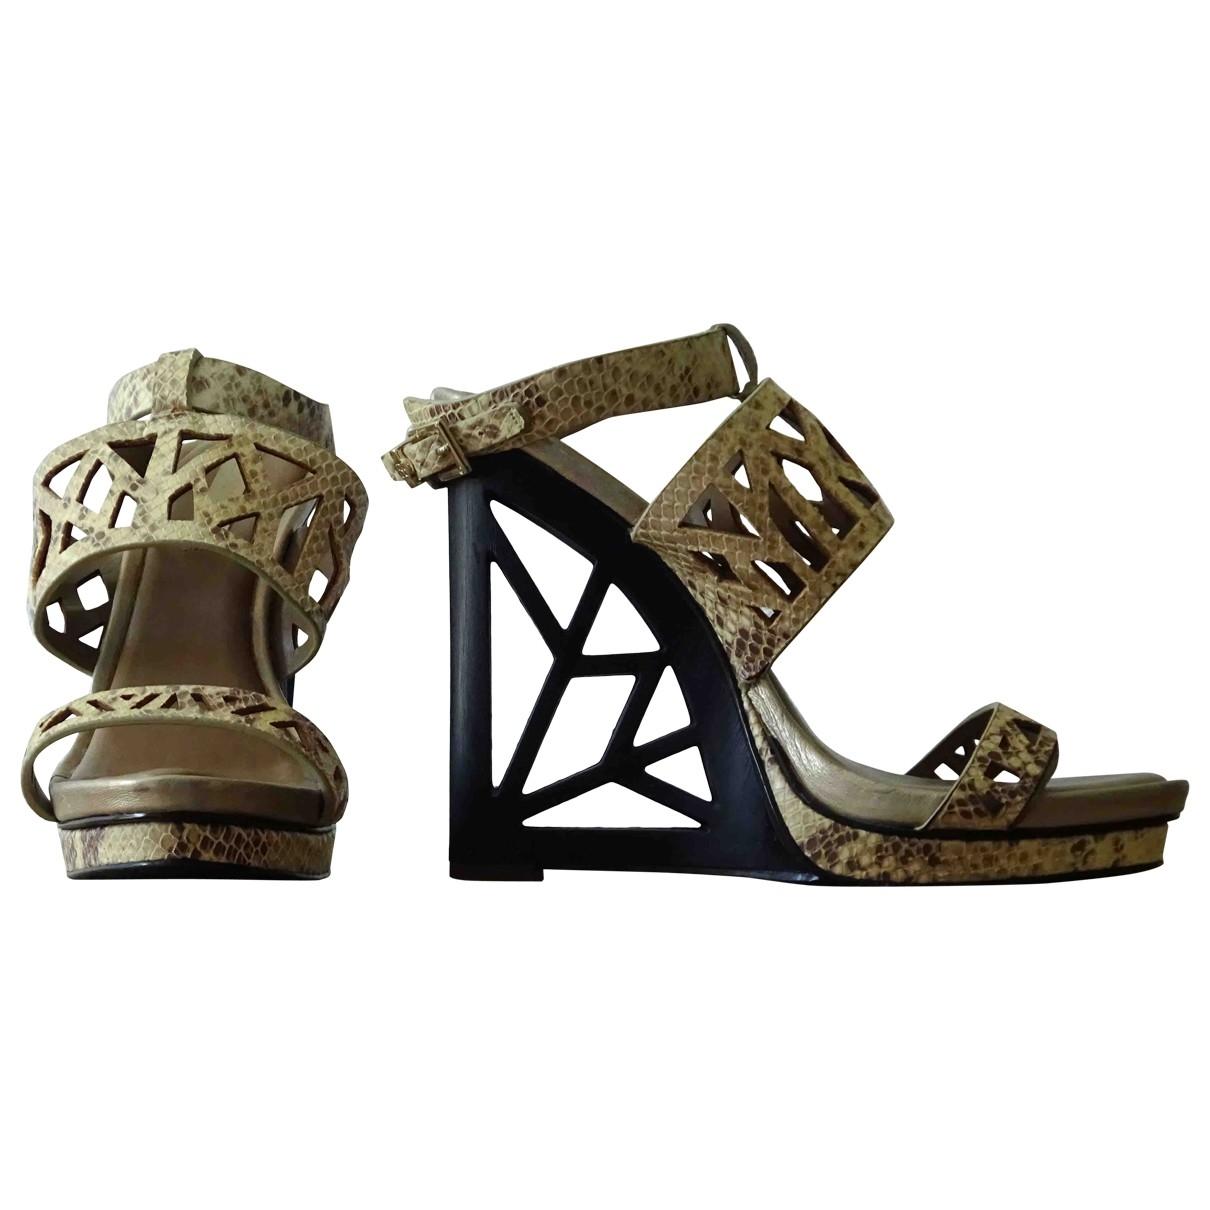 Sandalias de Cuero Bcbg Max Azria